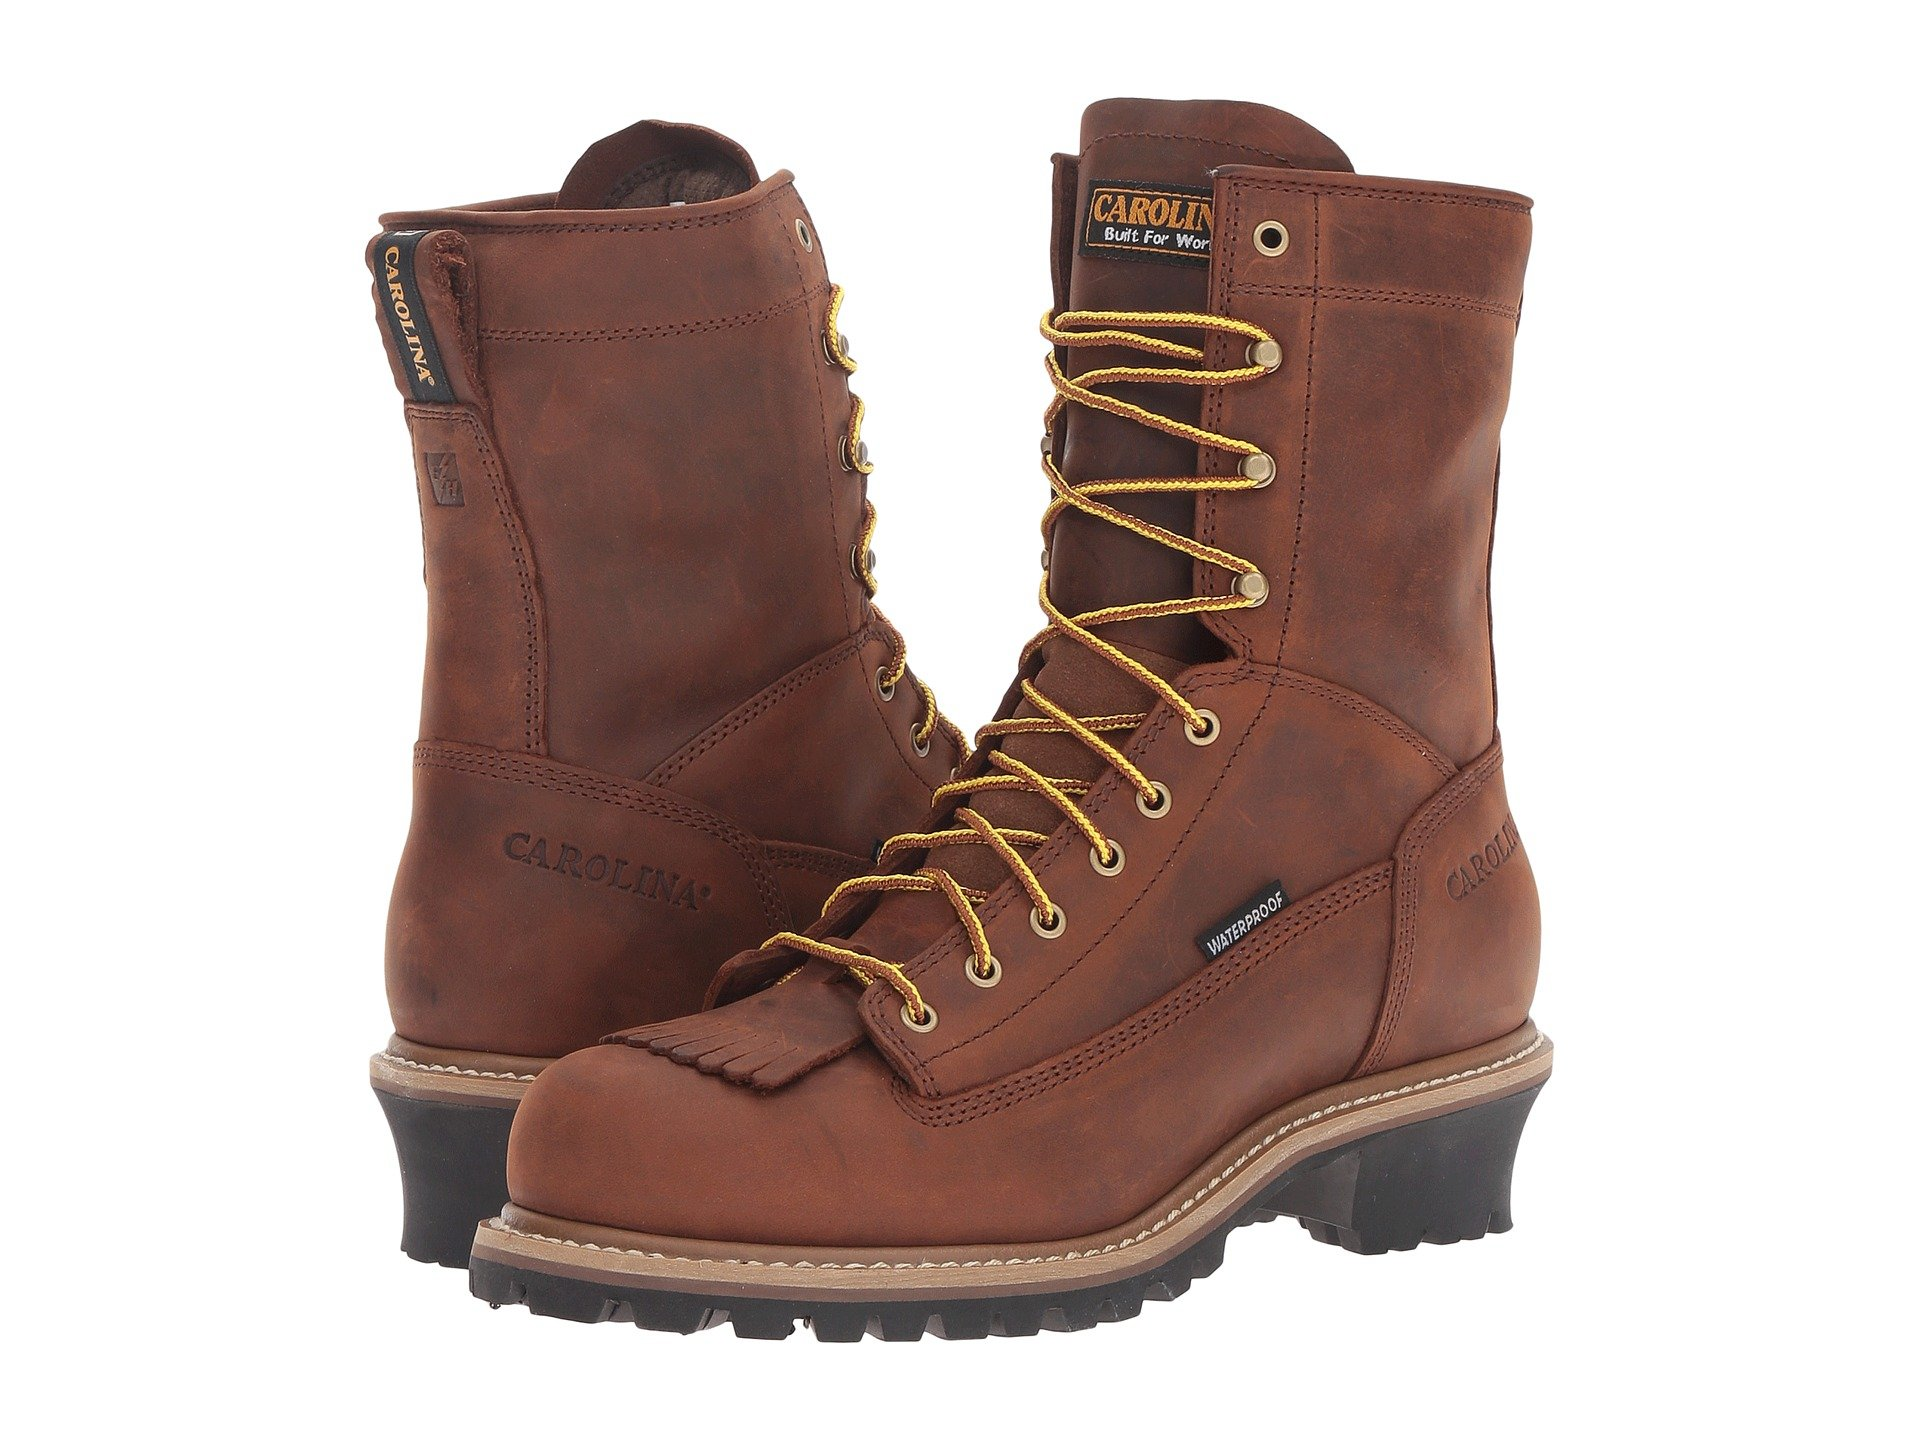 667e78c02561 Men's Carolina Boots + FREE SHIPPING | Shoes | Zappos.com